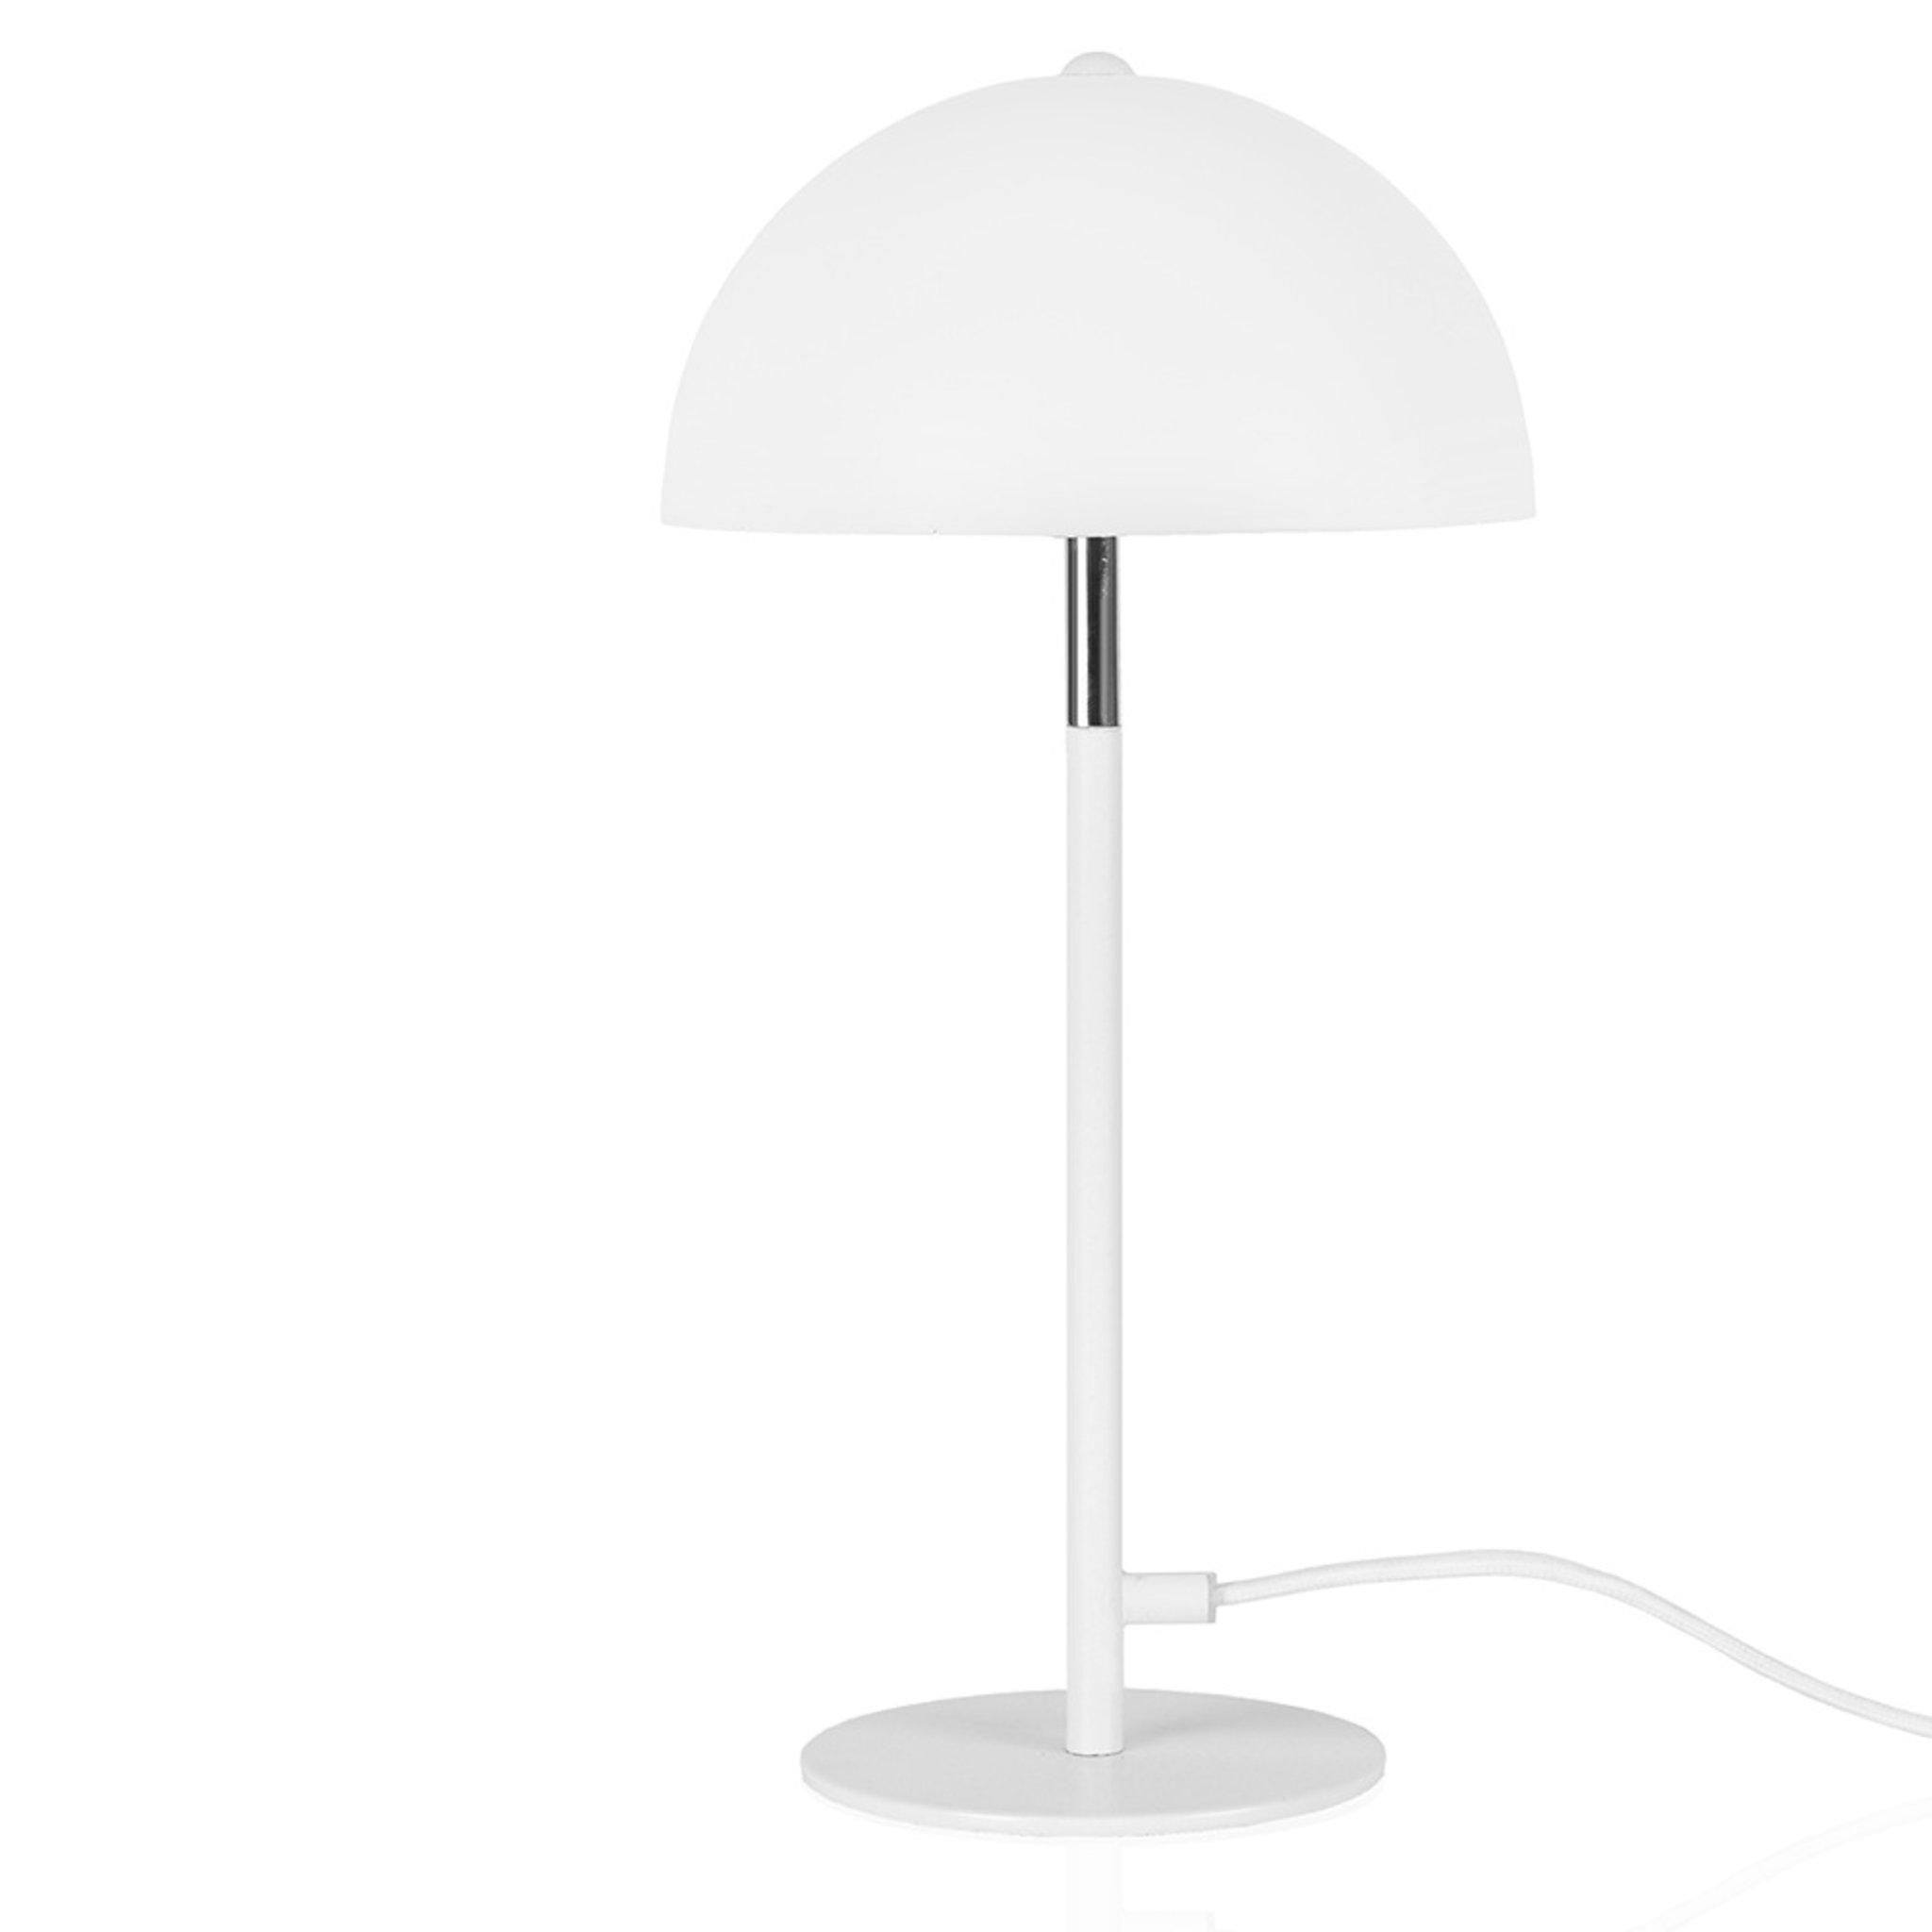 Bordslampa Icon Lampor Köp online på åhlens.se!